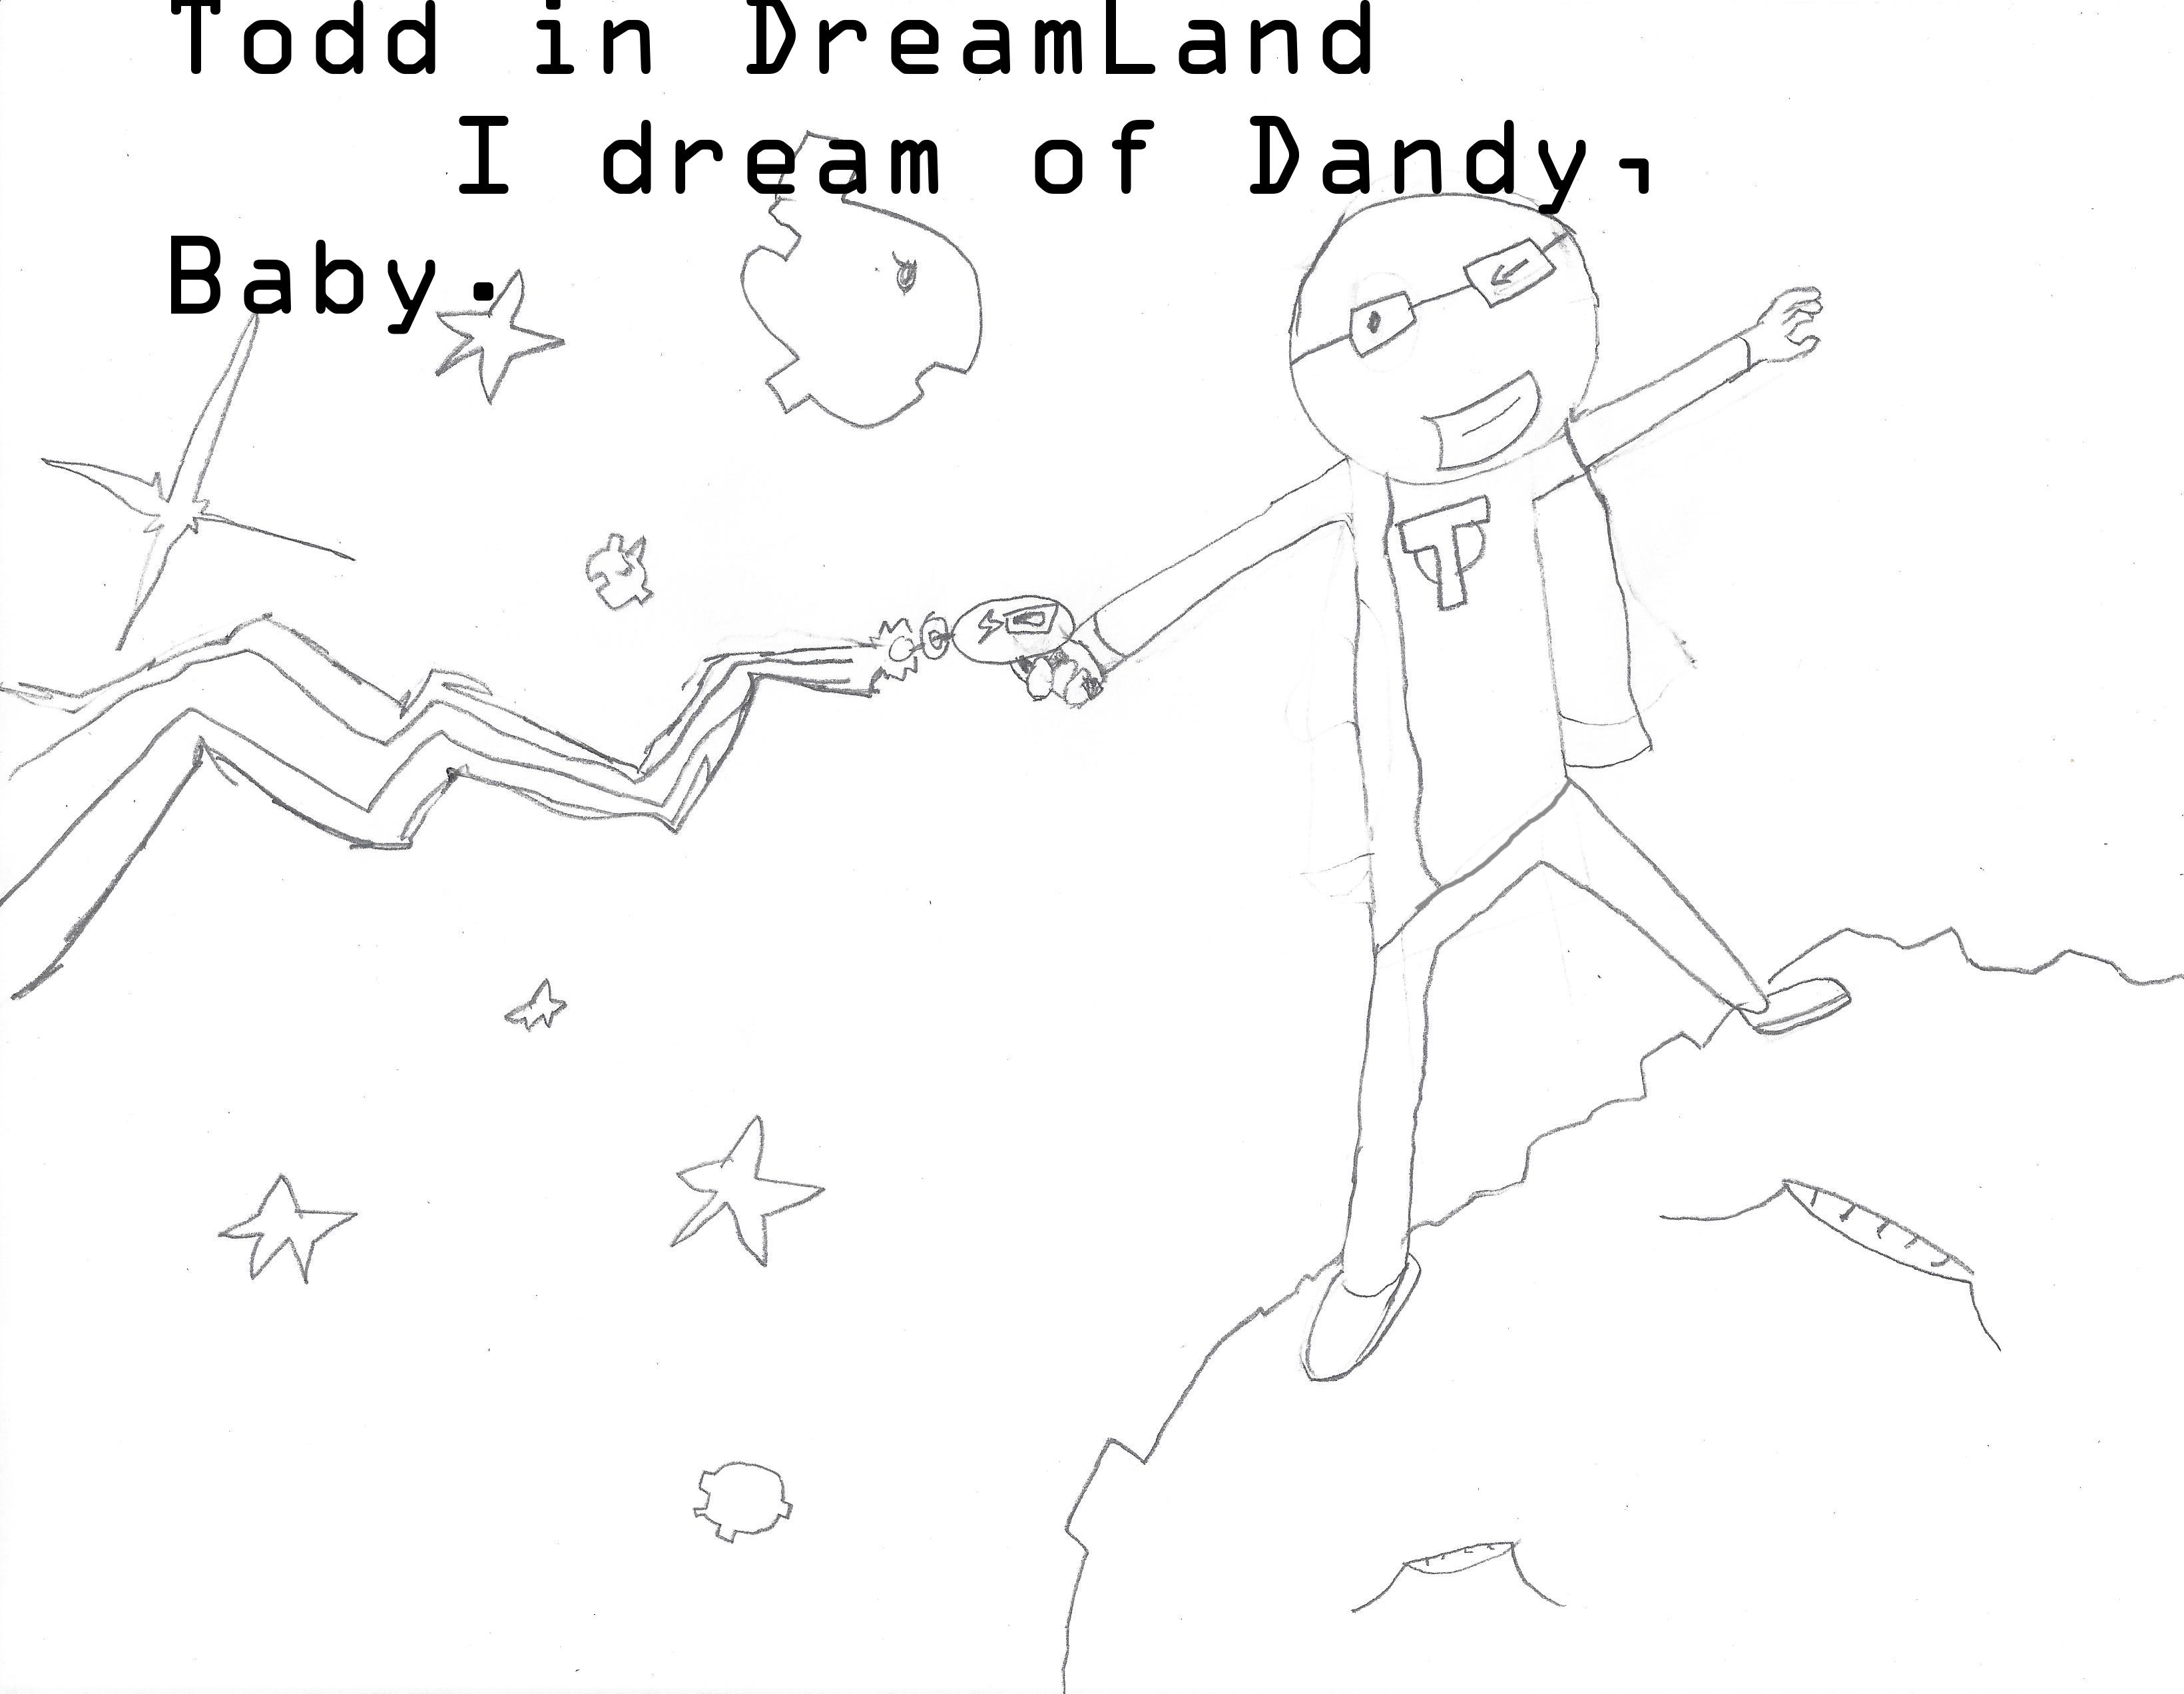 I dream of Dandy, Baby.